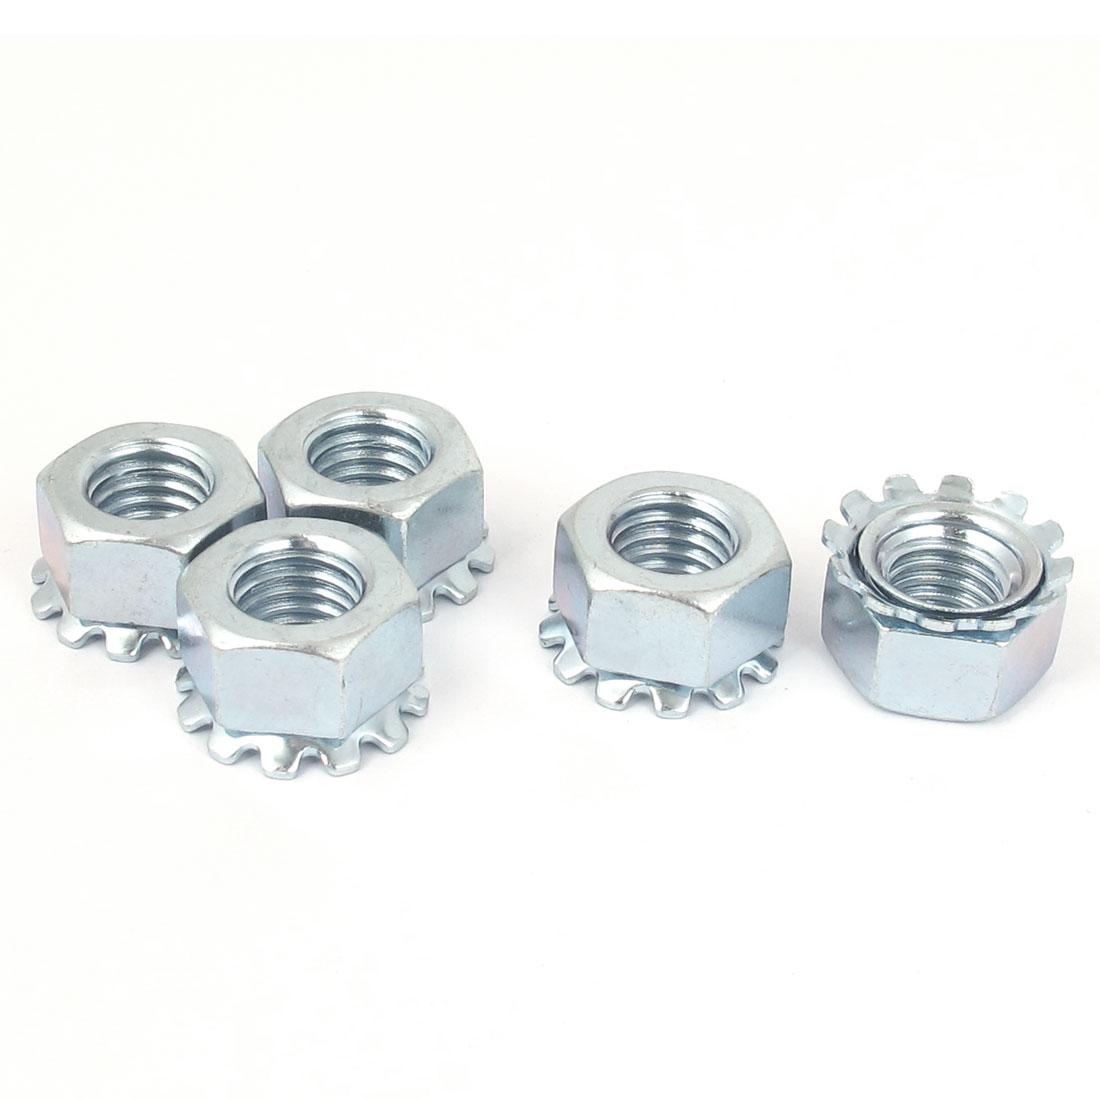 M12 Thread Dia Zinc Plated External Tooth Locknuts Kep Nut Silver Tone 5pcs